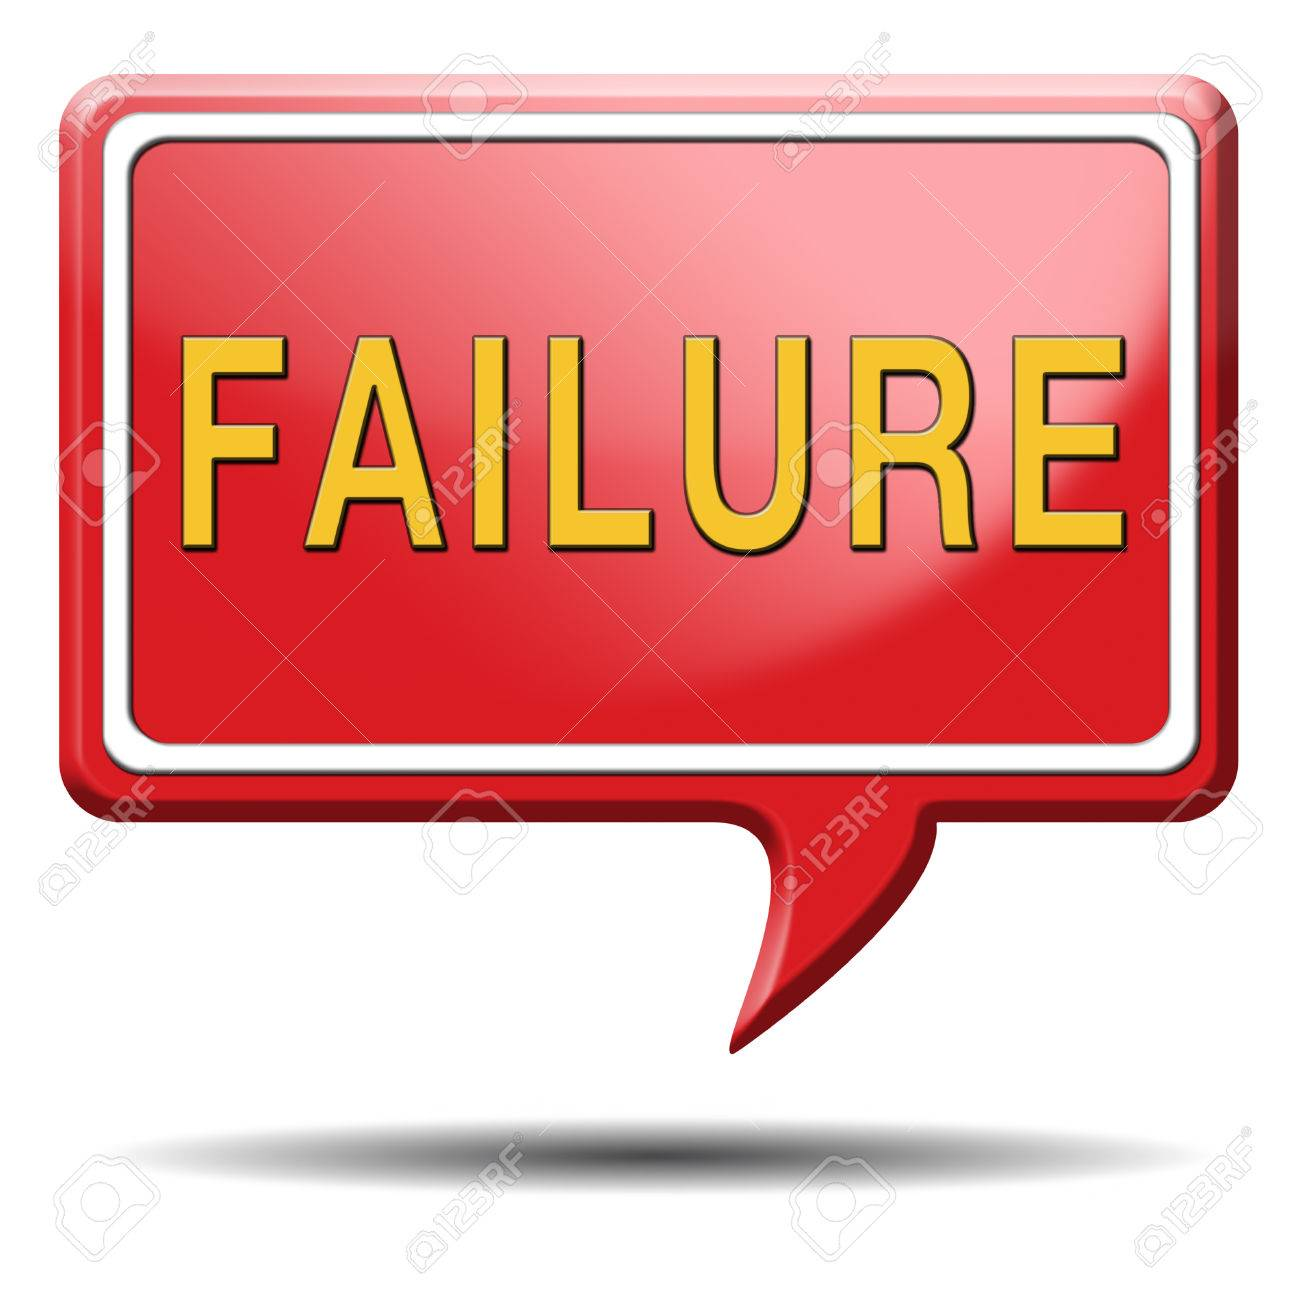 failure fail exam or attempt can be bad especially when failing